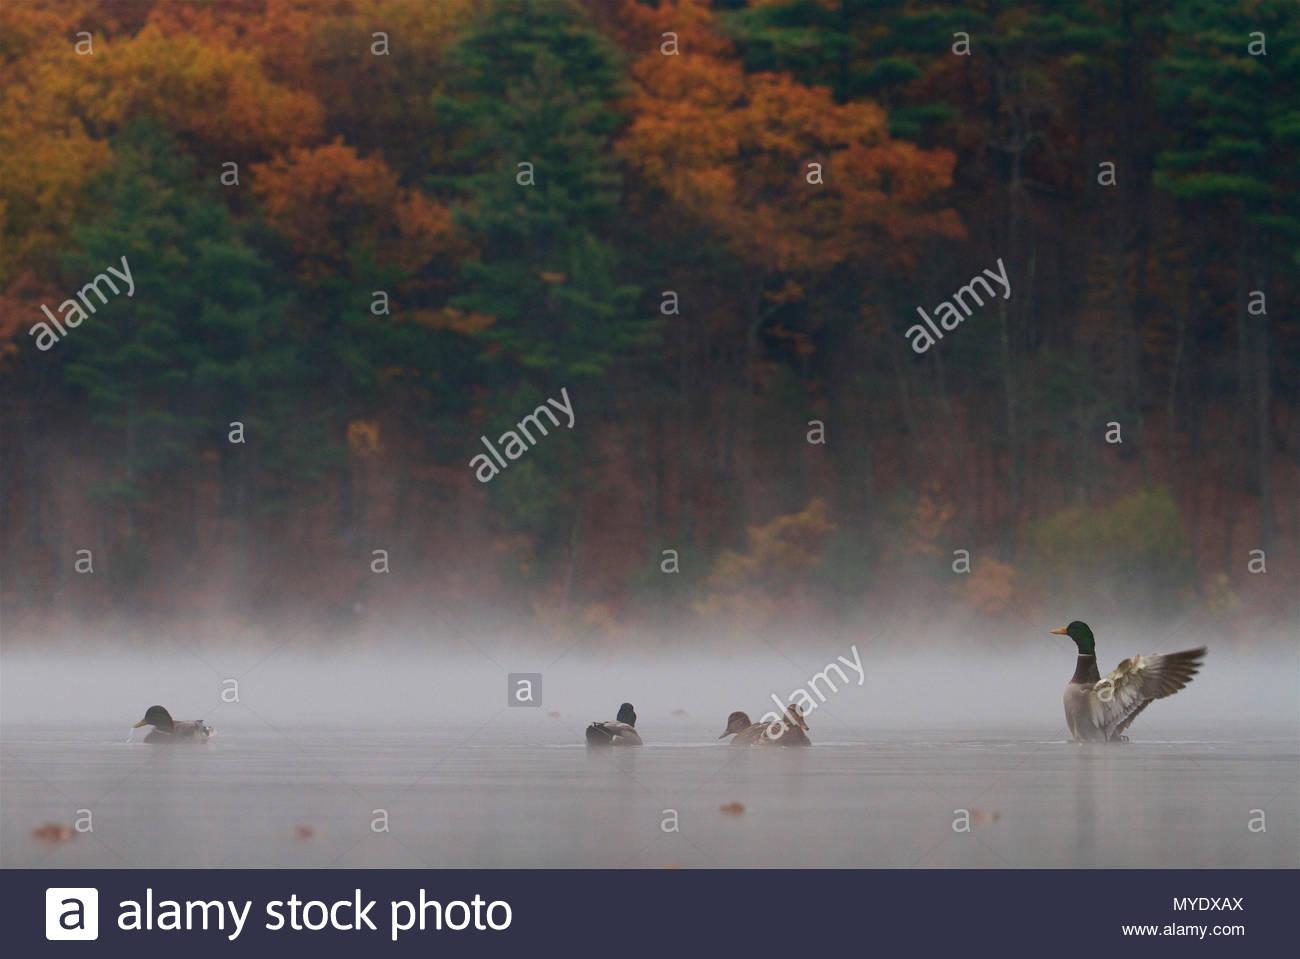 Mallards, Anas platyrhynchos, in the morning mist. - Stock Image